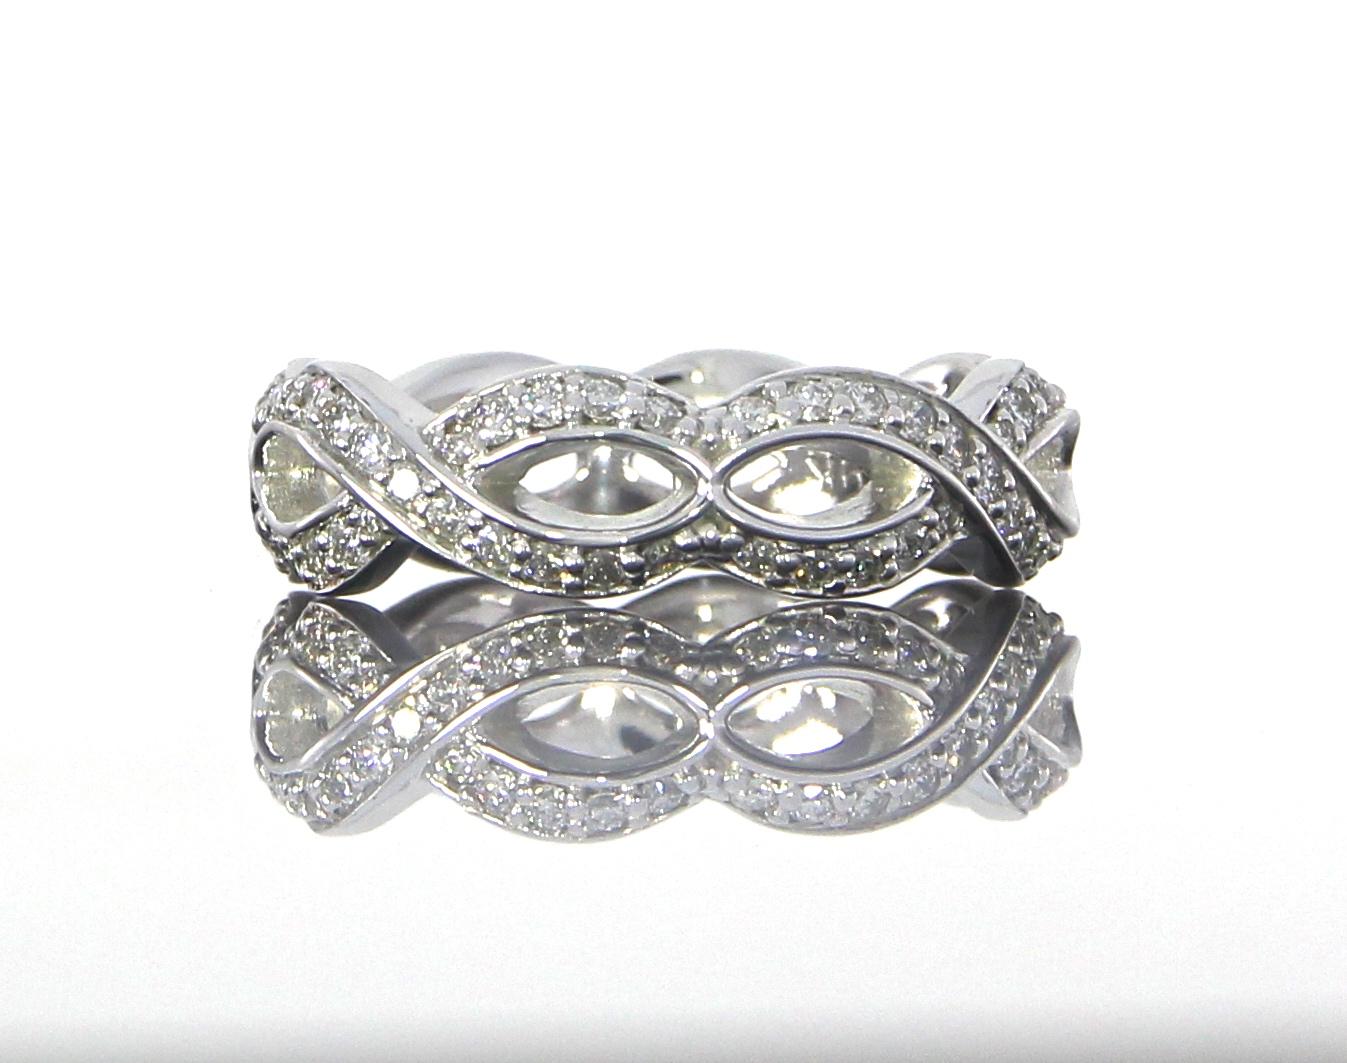 unique-ladies-vintage-twist-band-round-diamonds-white-gold-craft-revival-jewelers-store-grand-rapids